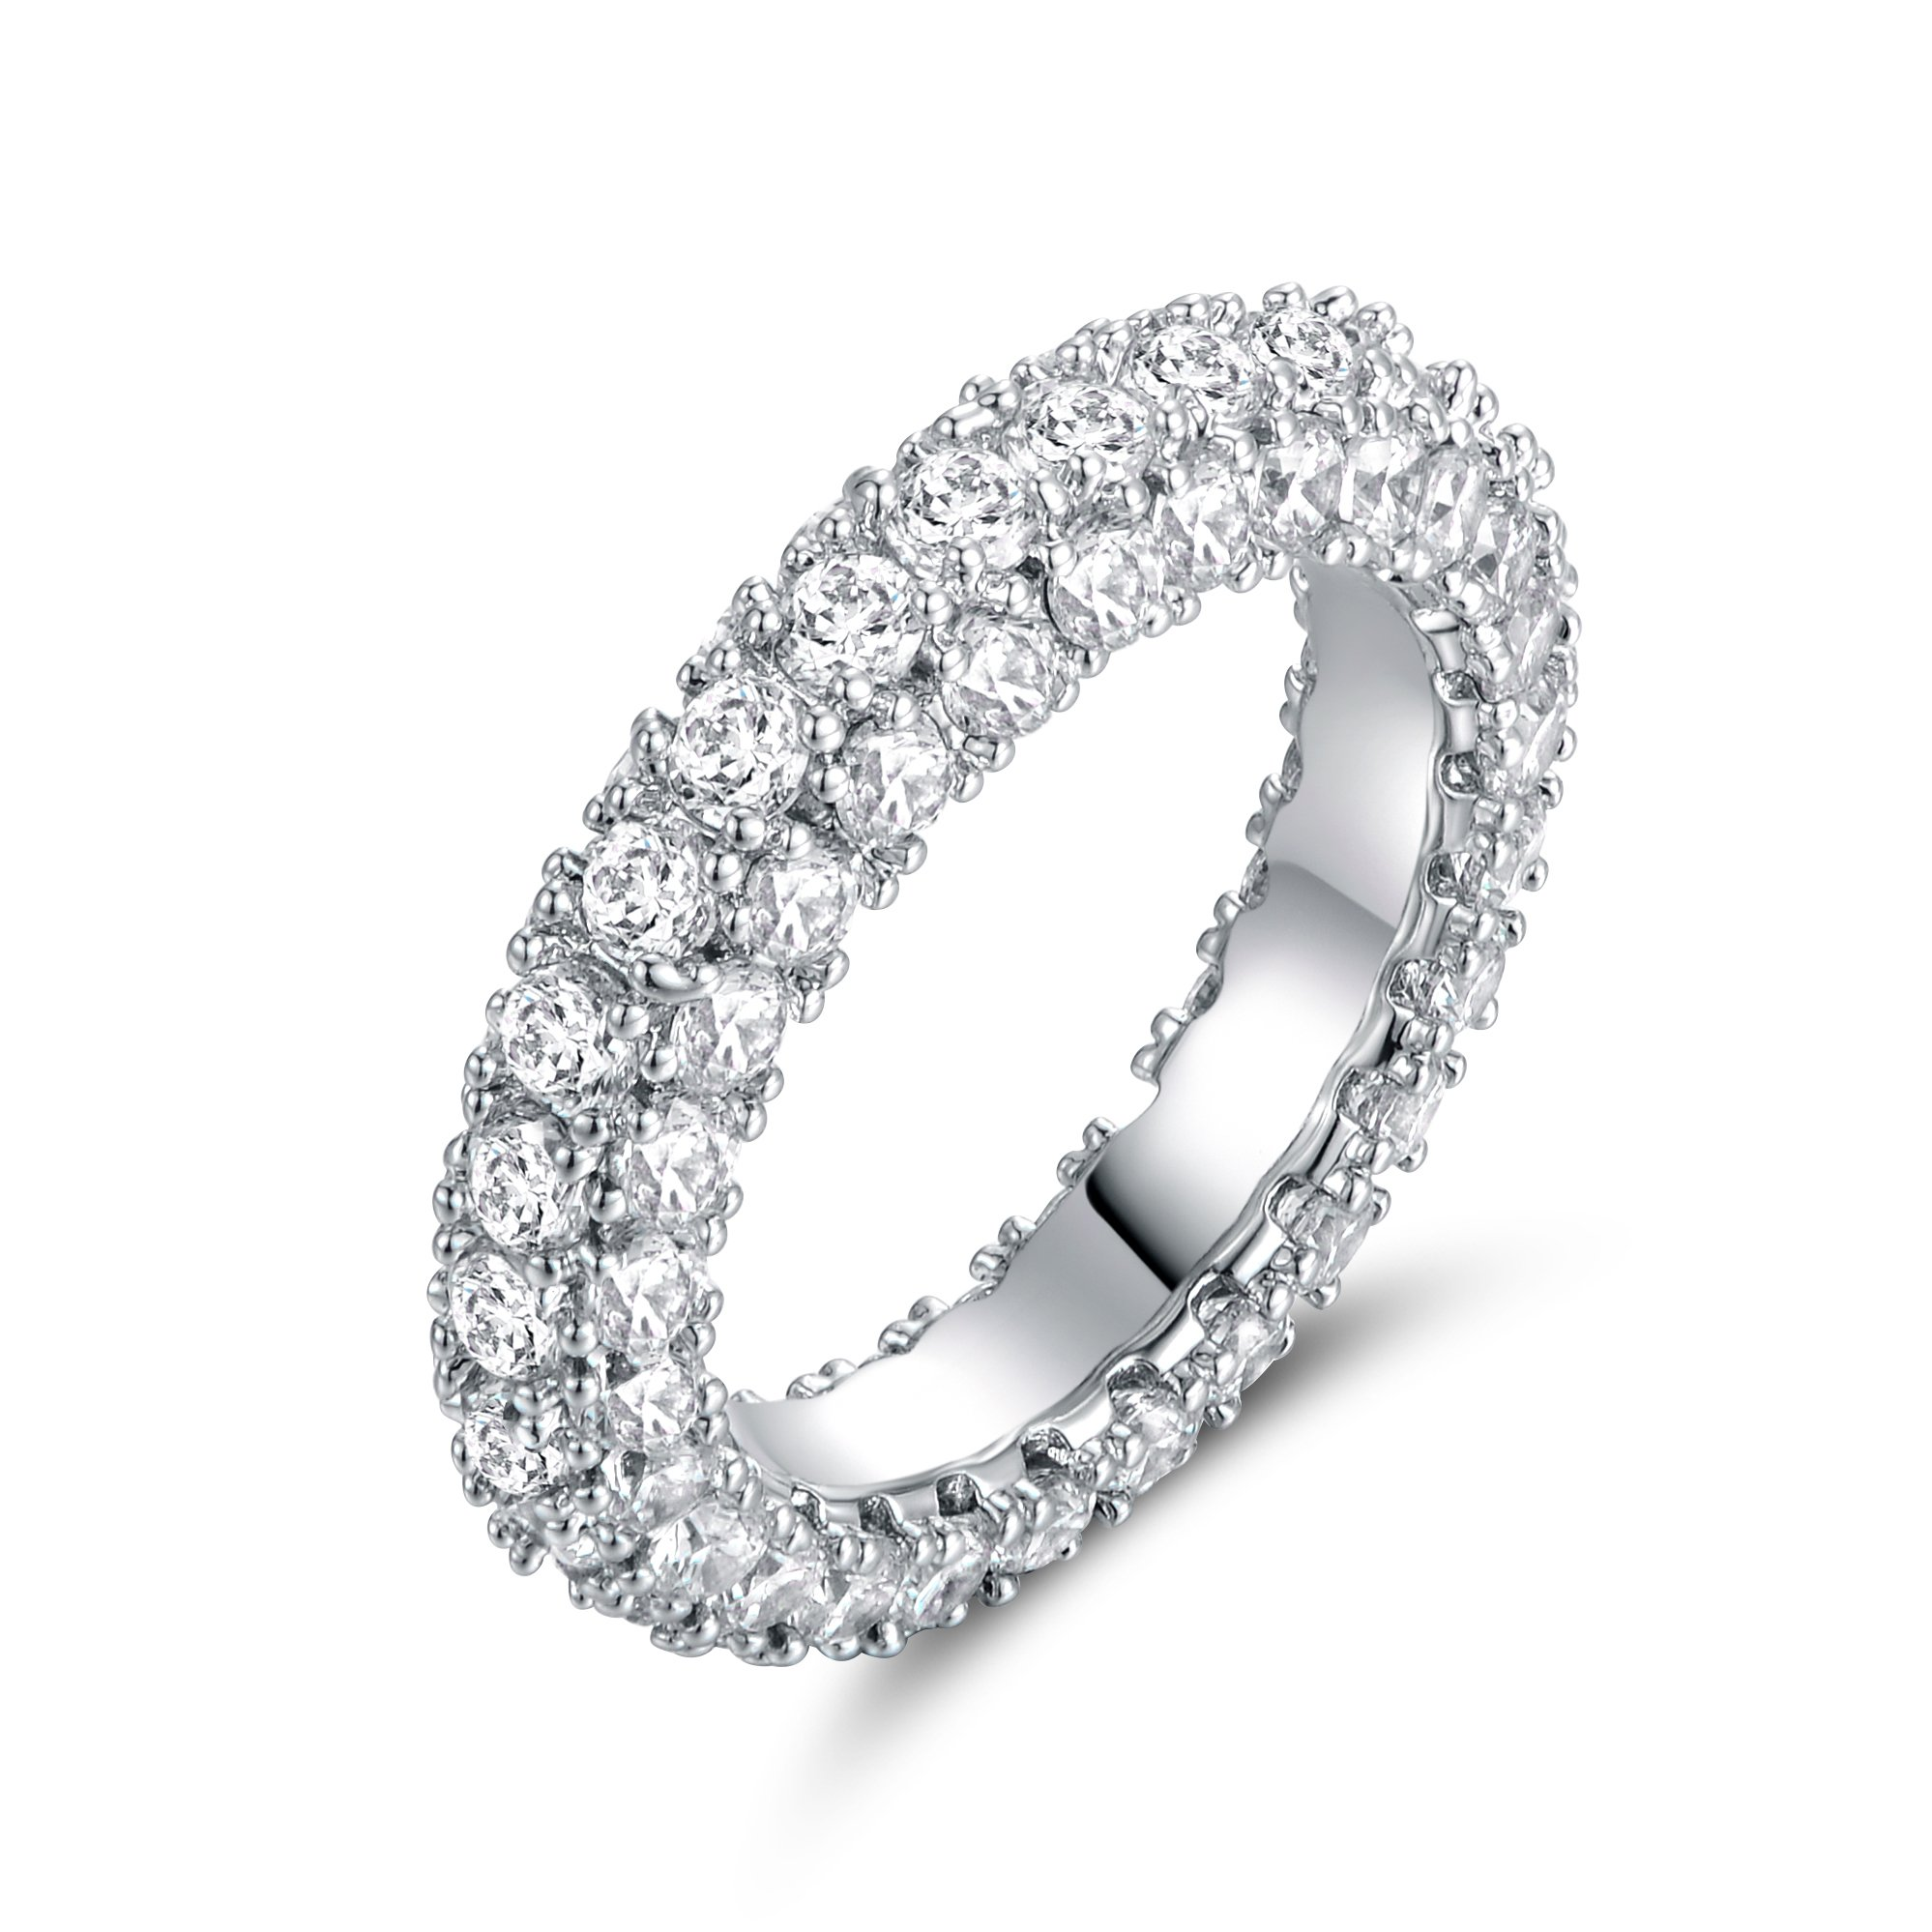 Barzel 18K White Gold Plated & Italian-Cut CZ 3 Row Eternity Ring (7)